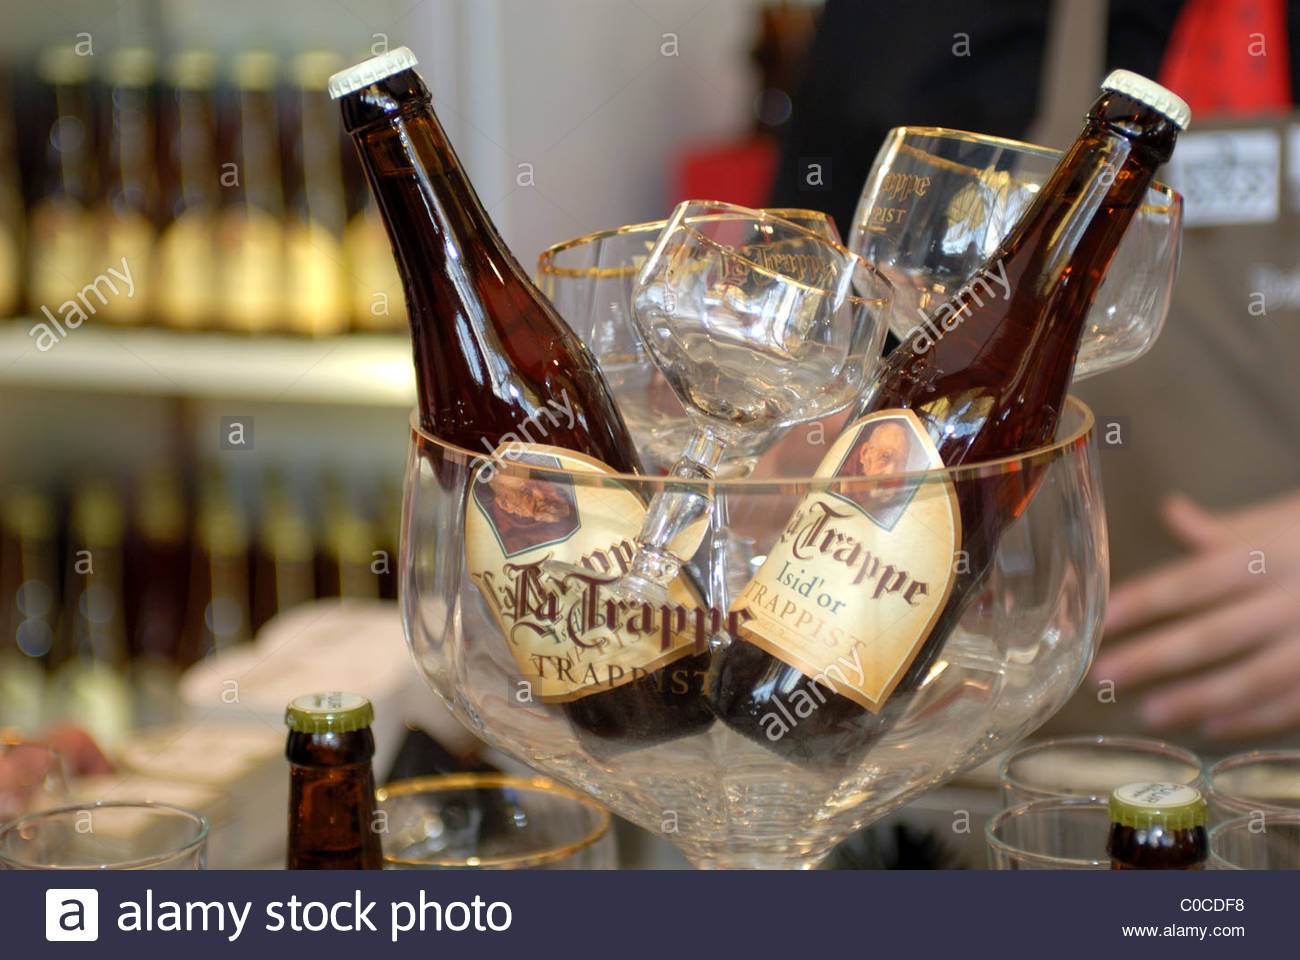 Amsterdam Annual Horecava hospitality trade fair. La Trappe trappist beers. - Stock Image